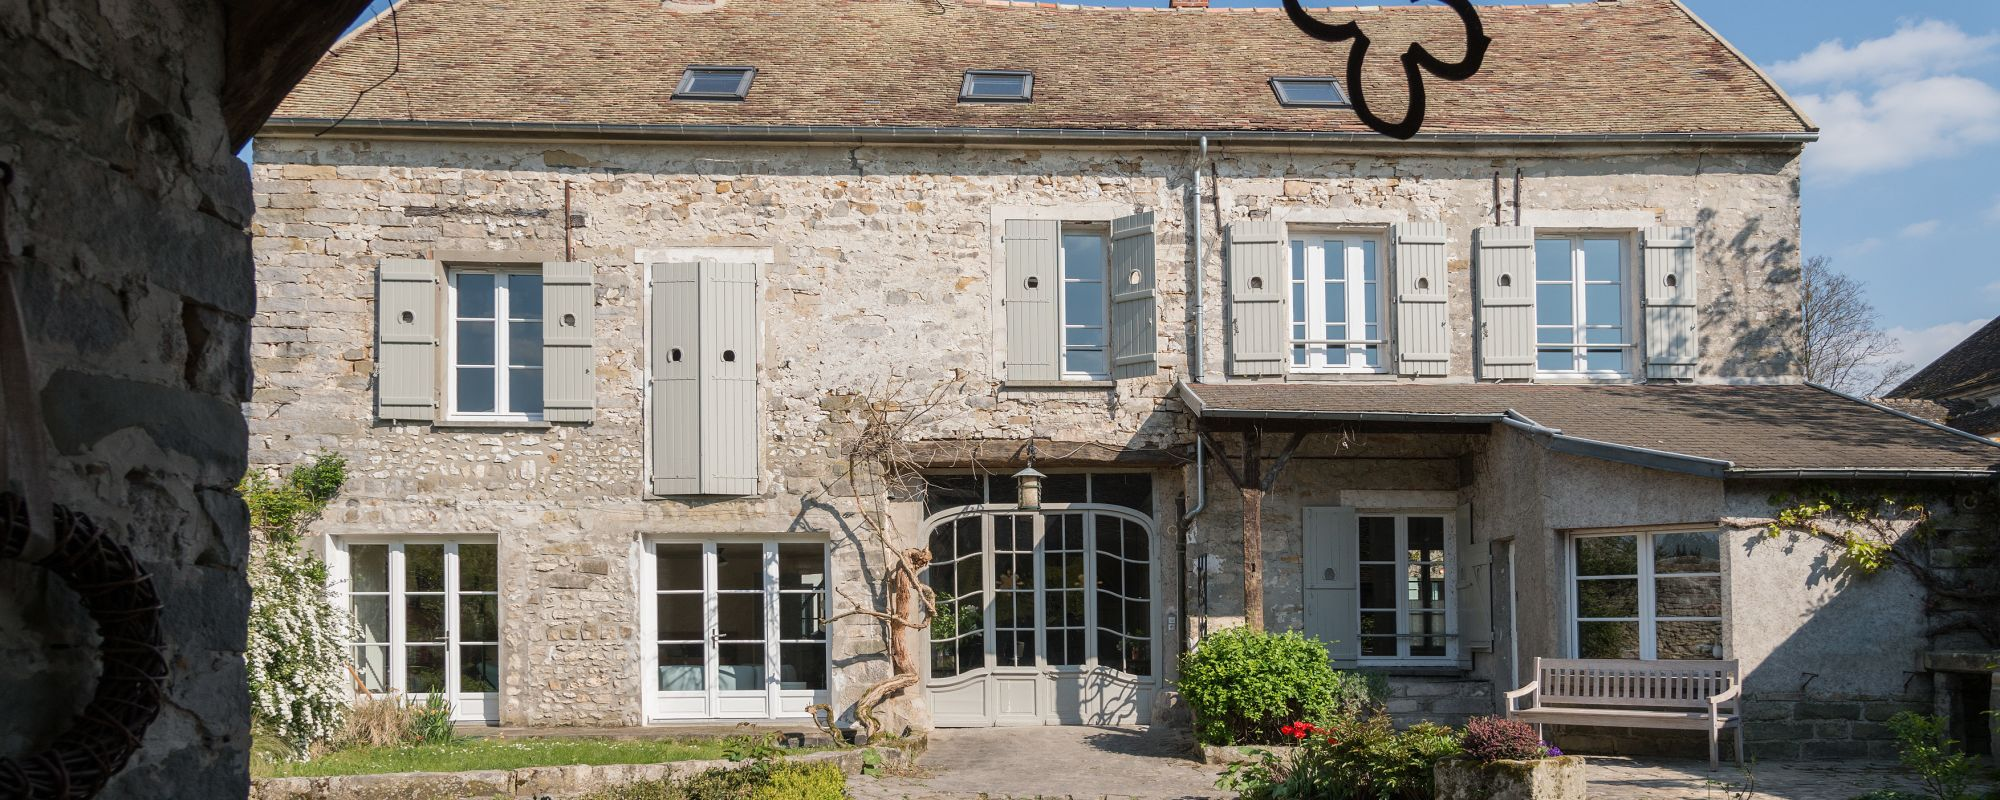 Courances Landhaus, Gesa Hansen Home